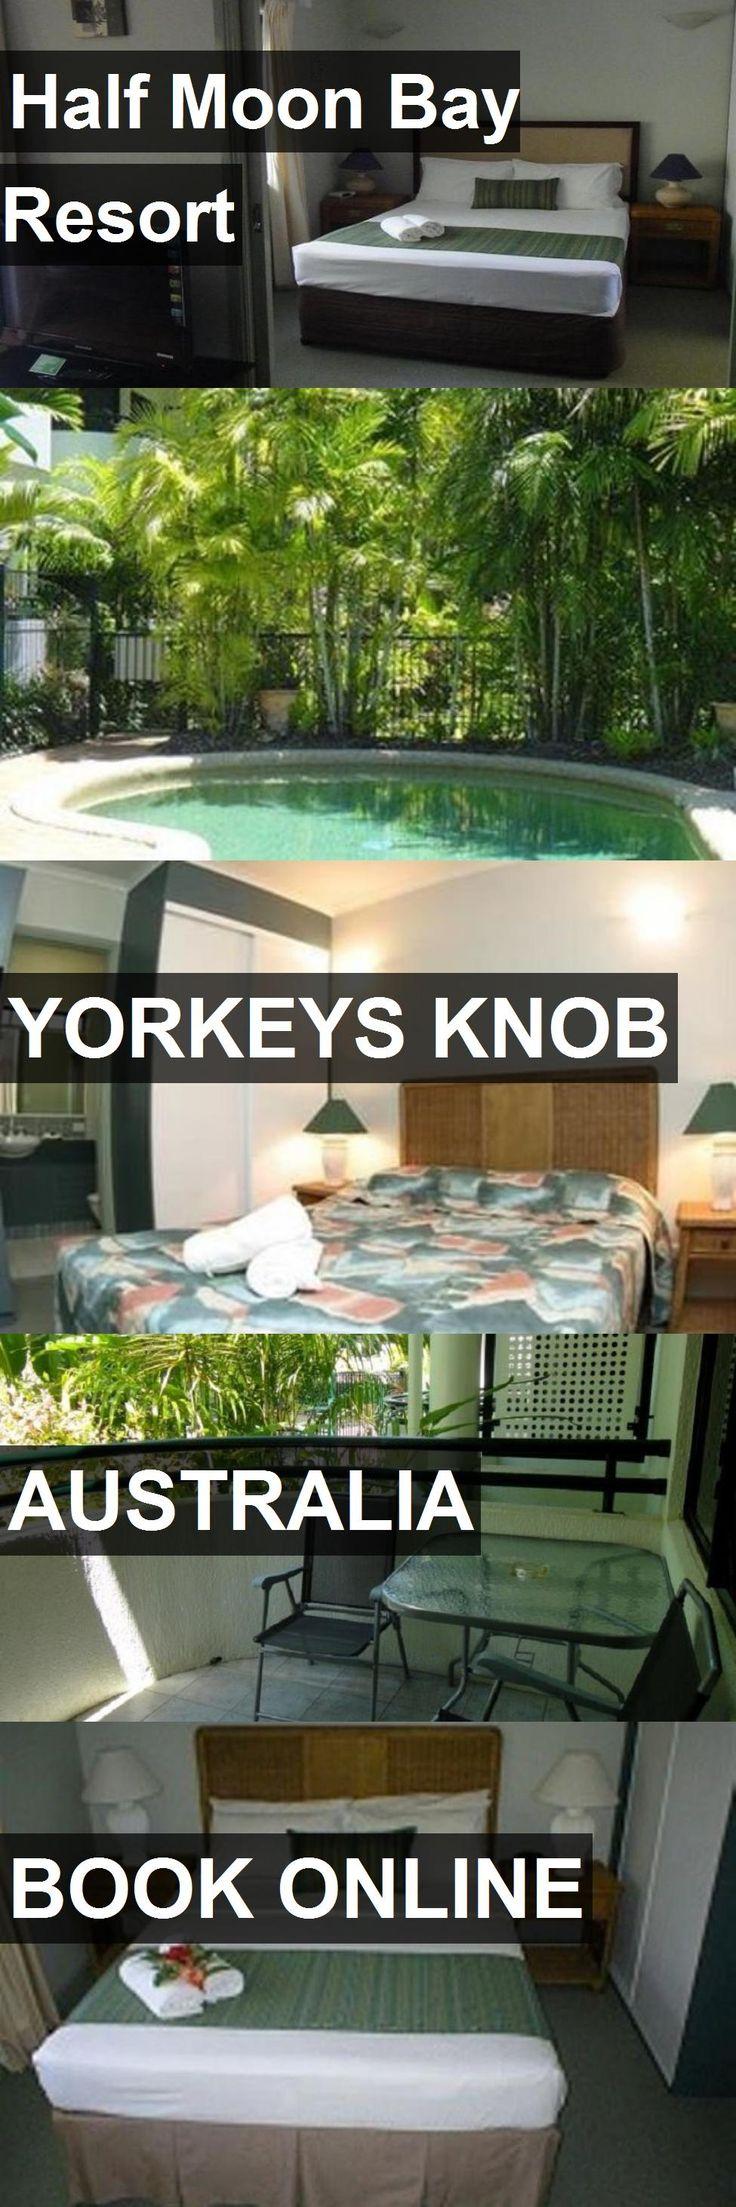 Hotel Half Moon Bay Resort in Yorkeys Knob, Australia. For more information, photos, reviews and best prices please follow the link. #Australia #YorkeysKnob #HalfMoonBayResort #hotel #travel #vacation